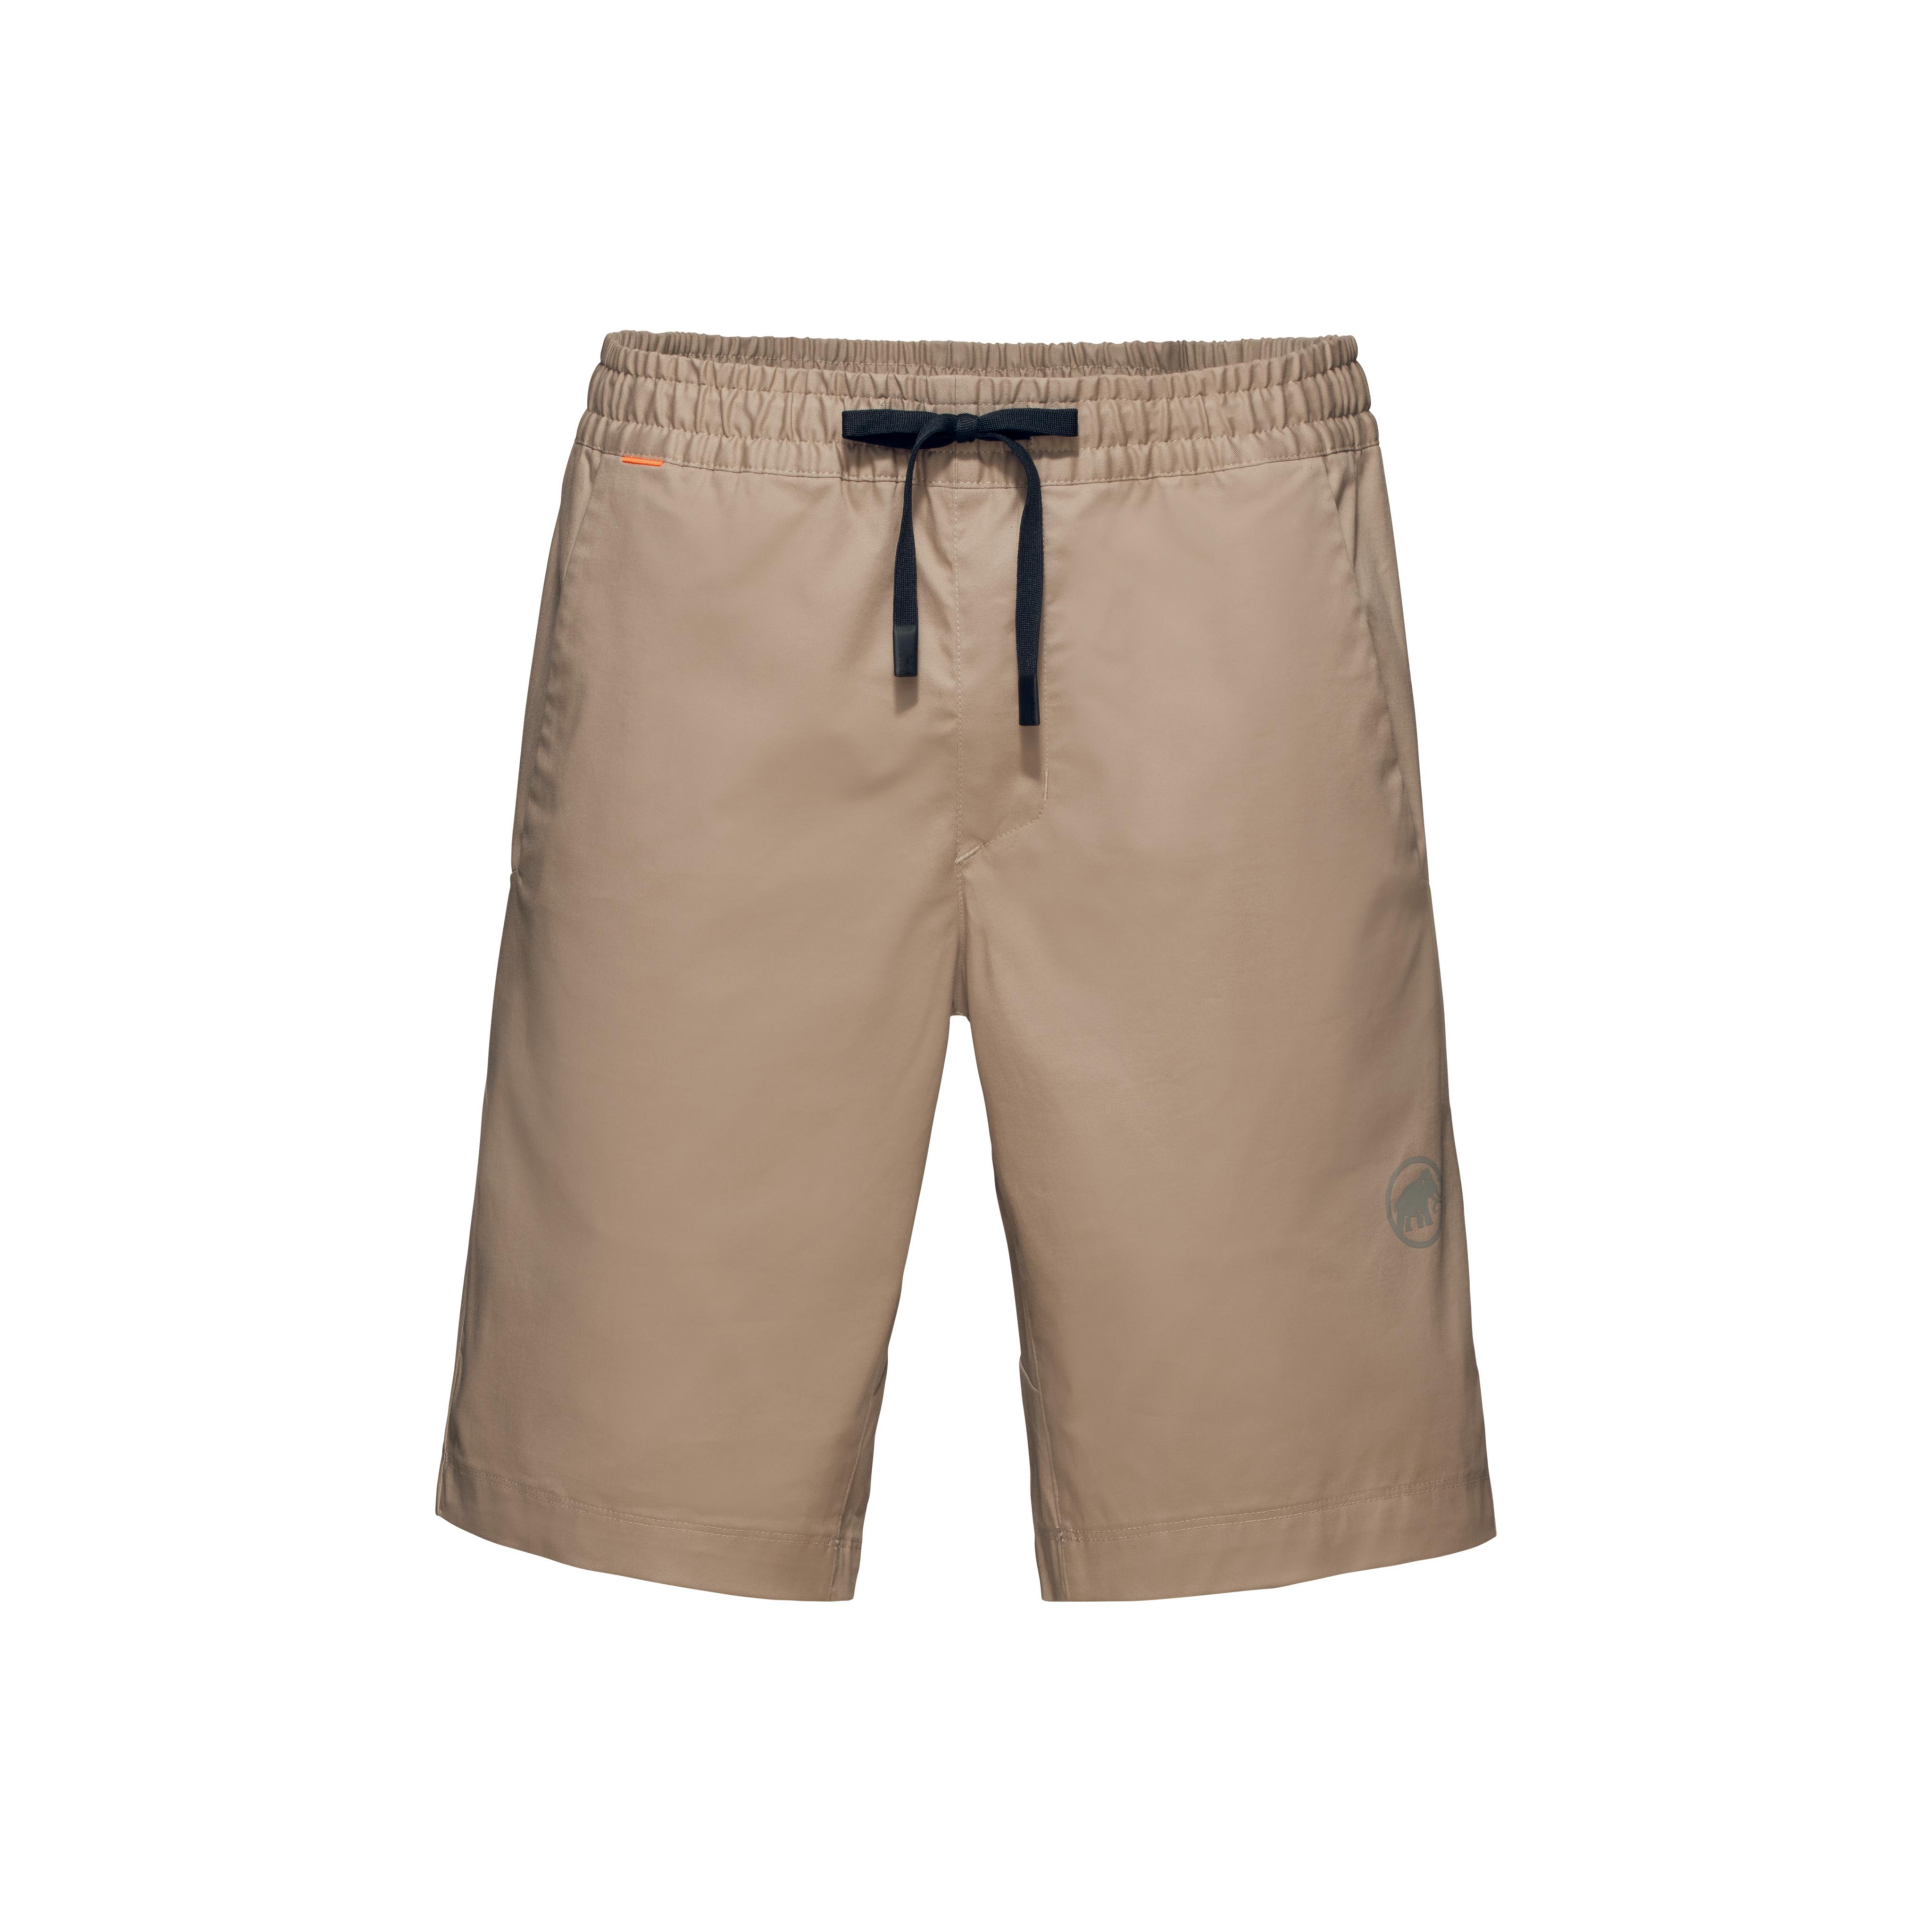 Camie Shorts Men - safari, UK 28 thumbnail